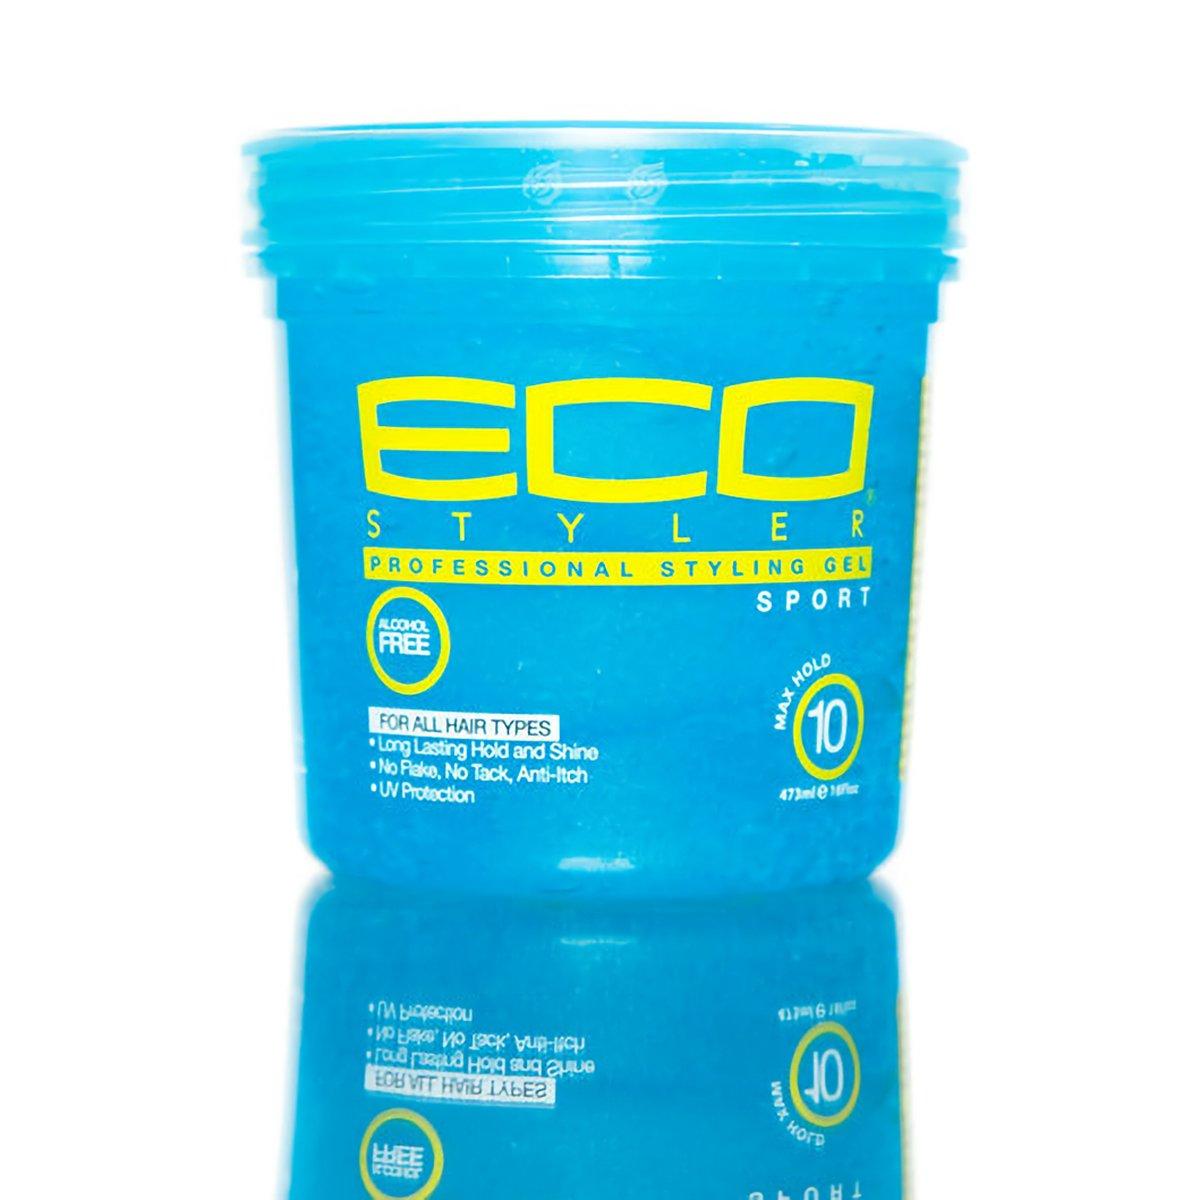 [ECO STYLER] PROFESSIONAL STYLING GEL SPORT MAXIMUM HOLD 16OZ BLUE Ecoco Inc.